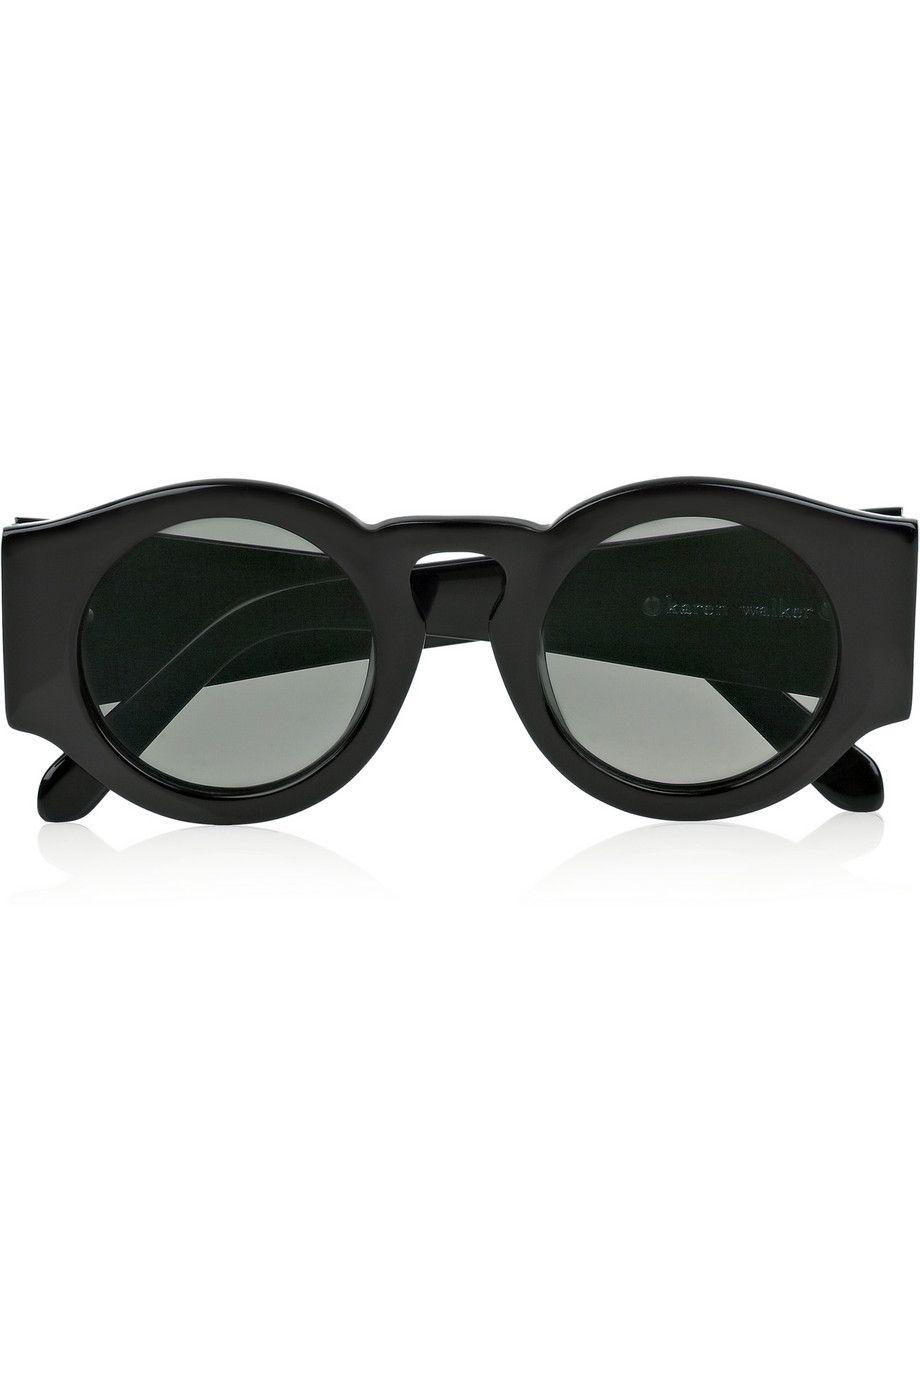 Karen Walker Blue Moon round-frame acetate sunglasses – 65% at THE ...